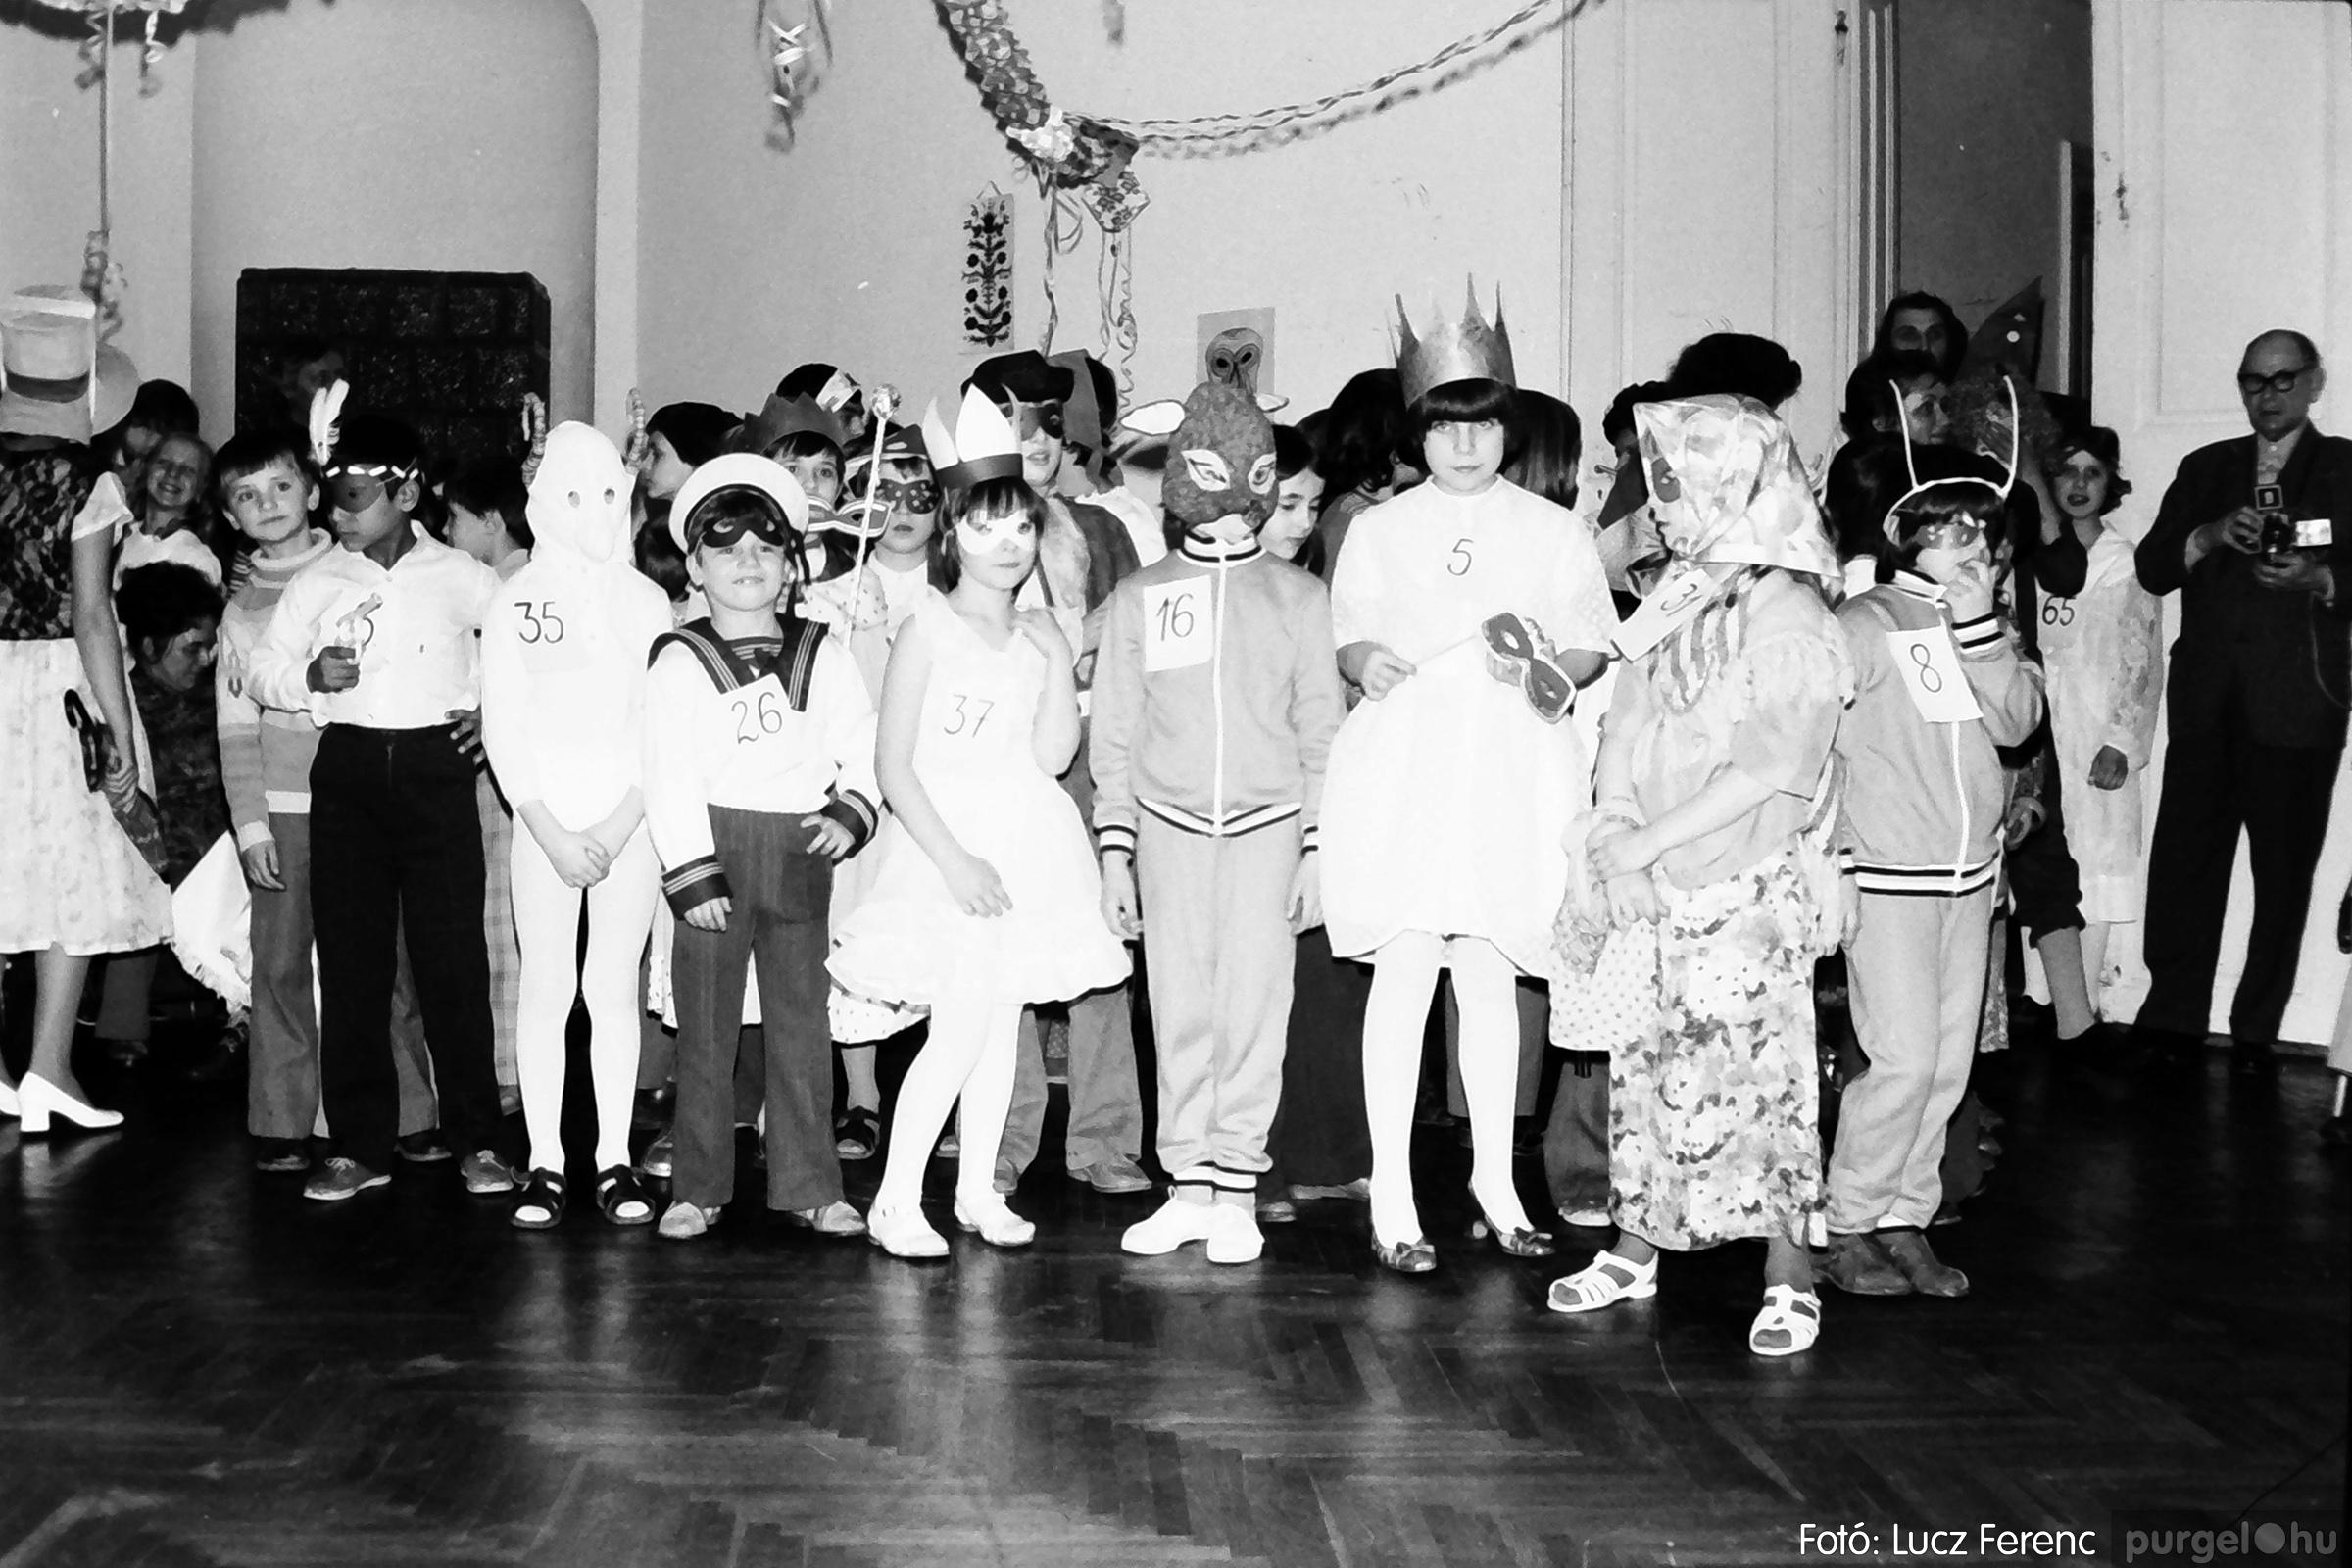 074. 1977. Farsang a gyermekotthonban 007. - Fotó: Lucz Ferenc.jpg